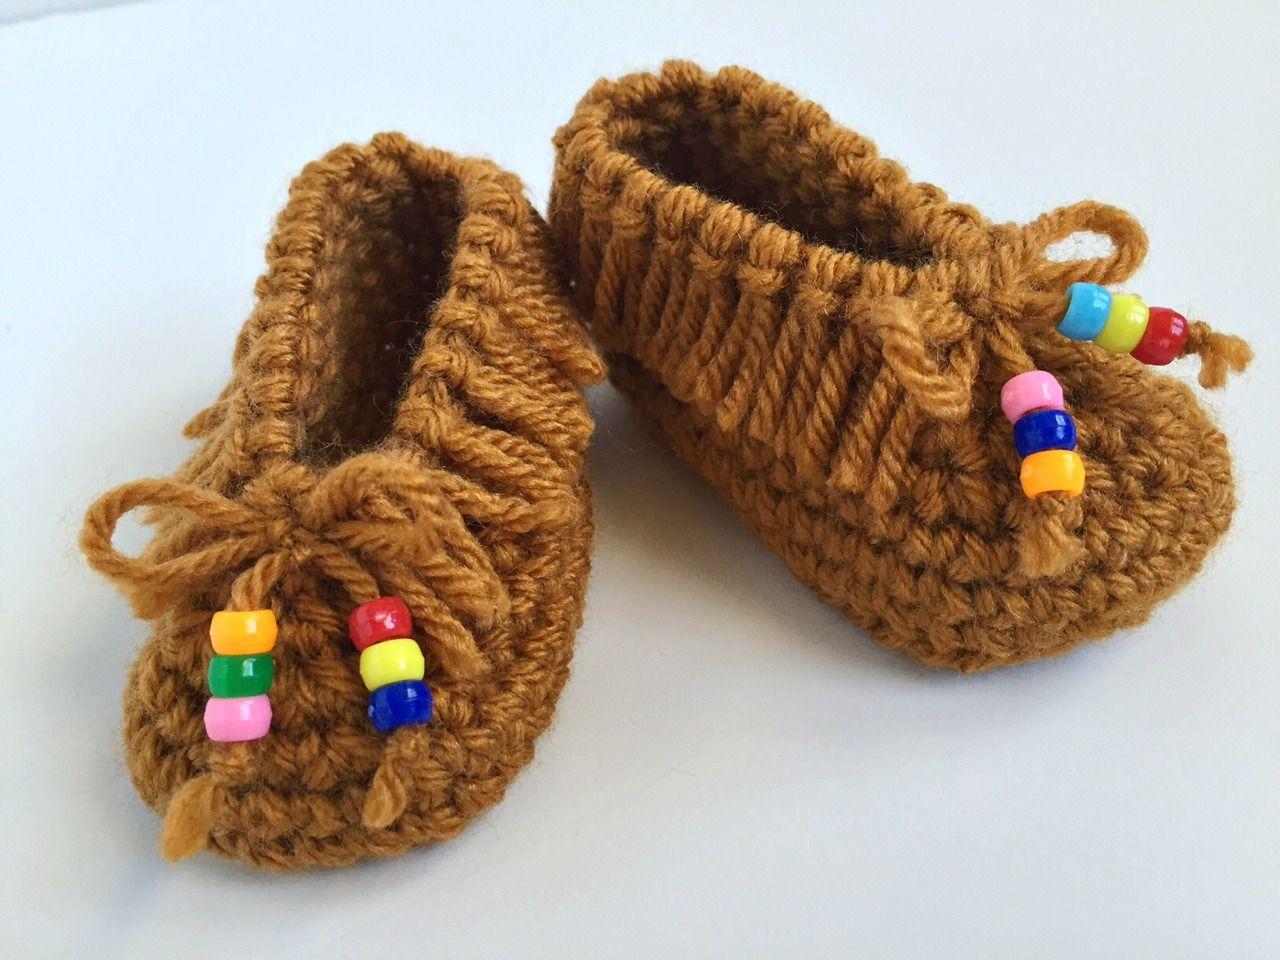 Crochet baby moccasins httpthislovelylife blogspot free pattern crochet baby mocasin all free crochet pattern video tutorial bankloansurffo Choice Image